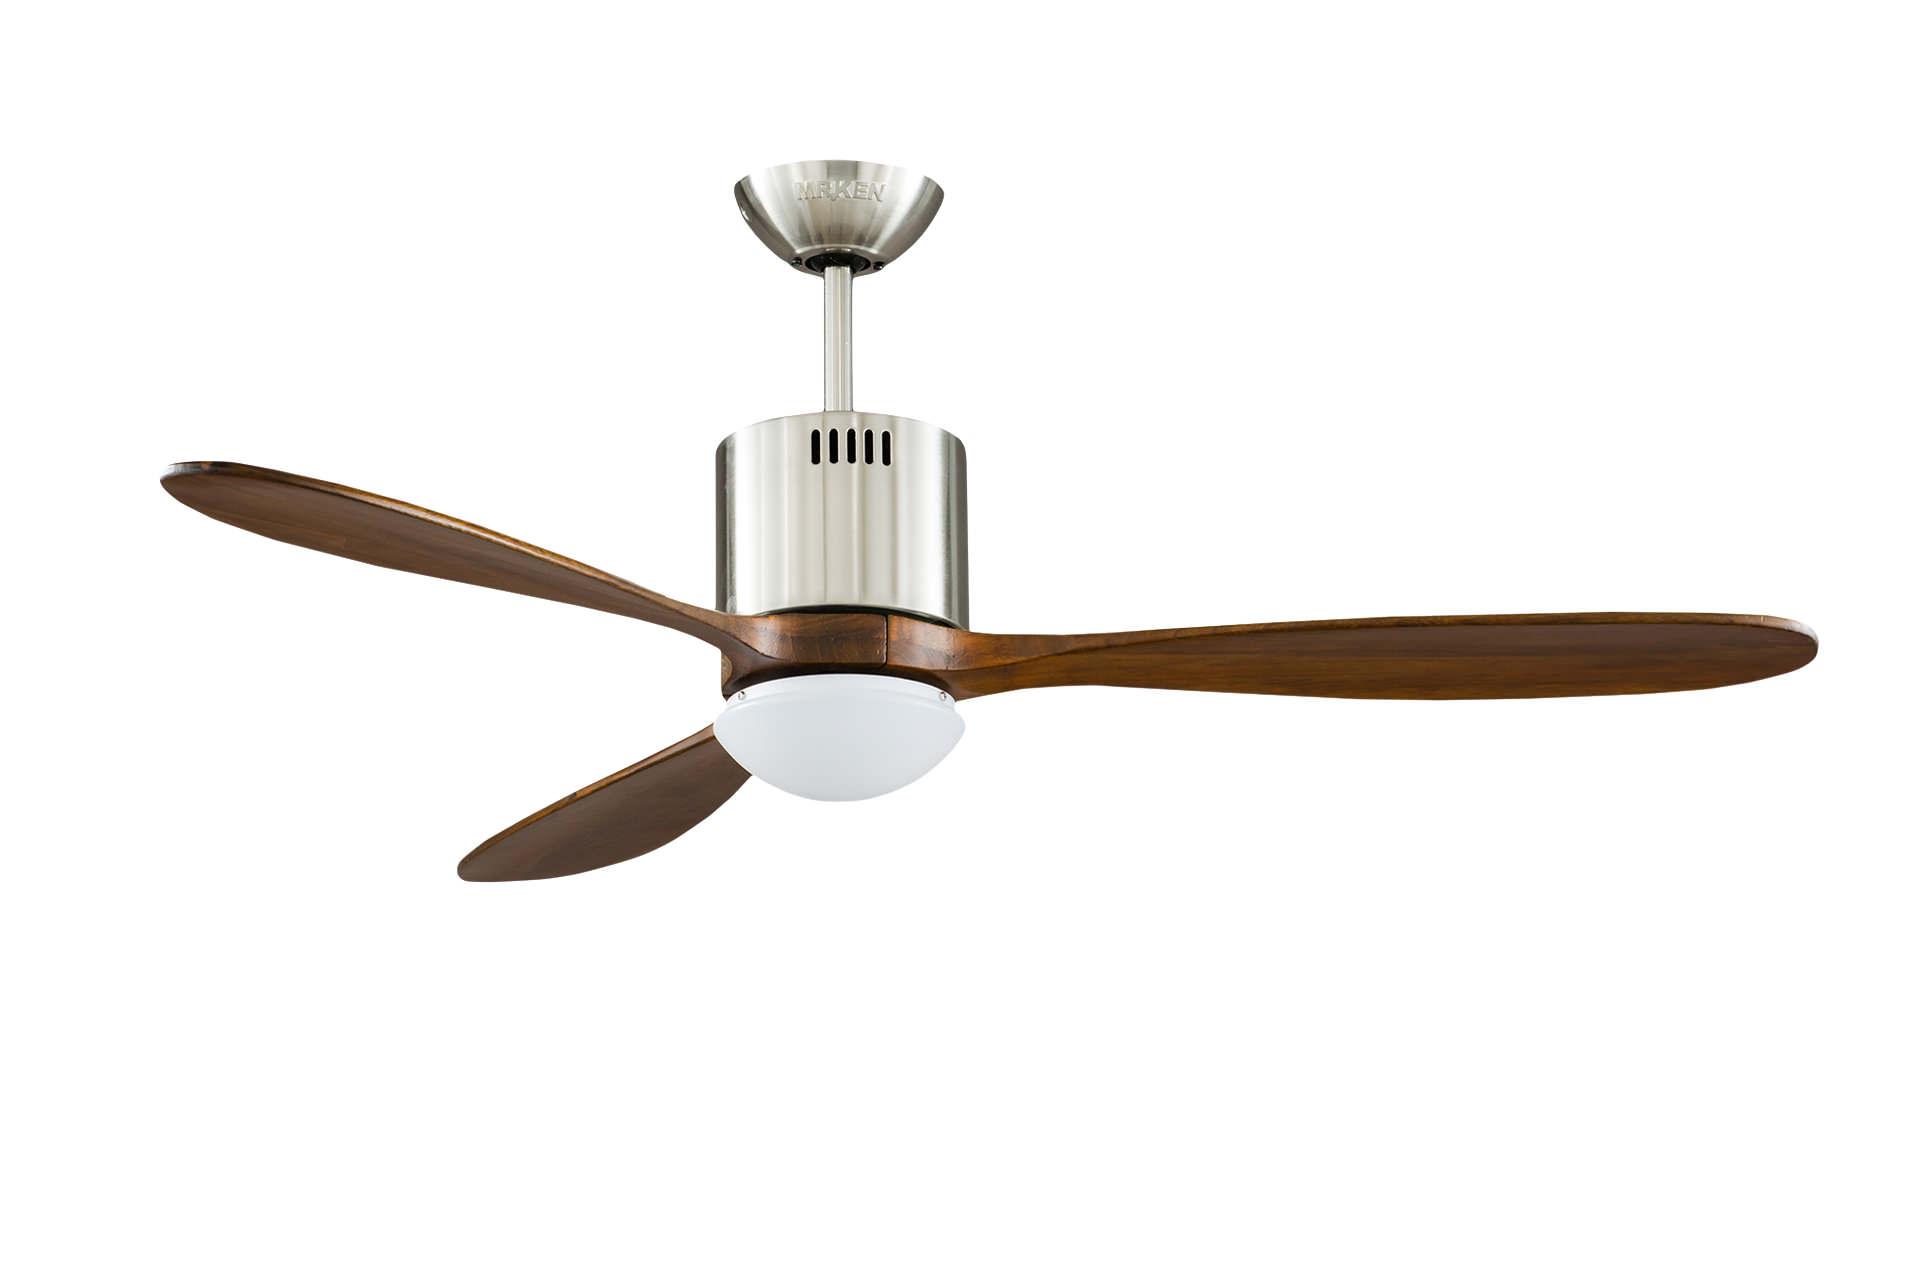 Mrken Pilot 3d Designer Low Energy Dc Ceiling Fan New